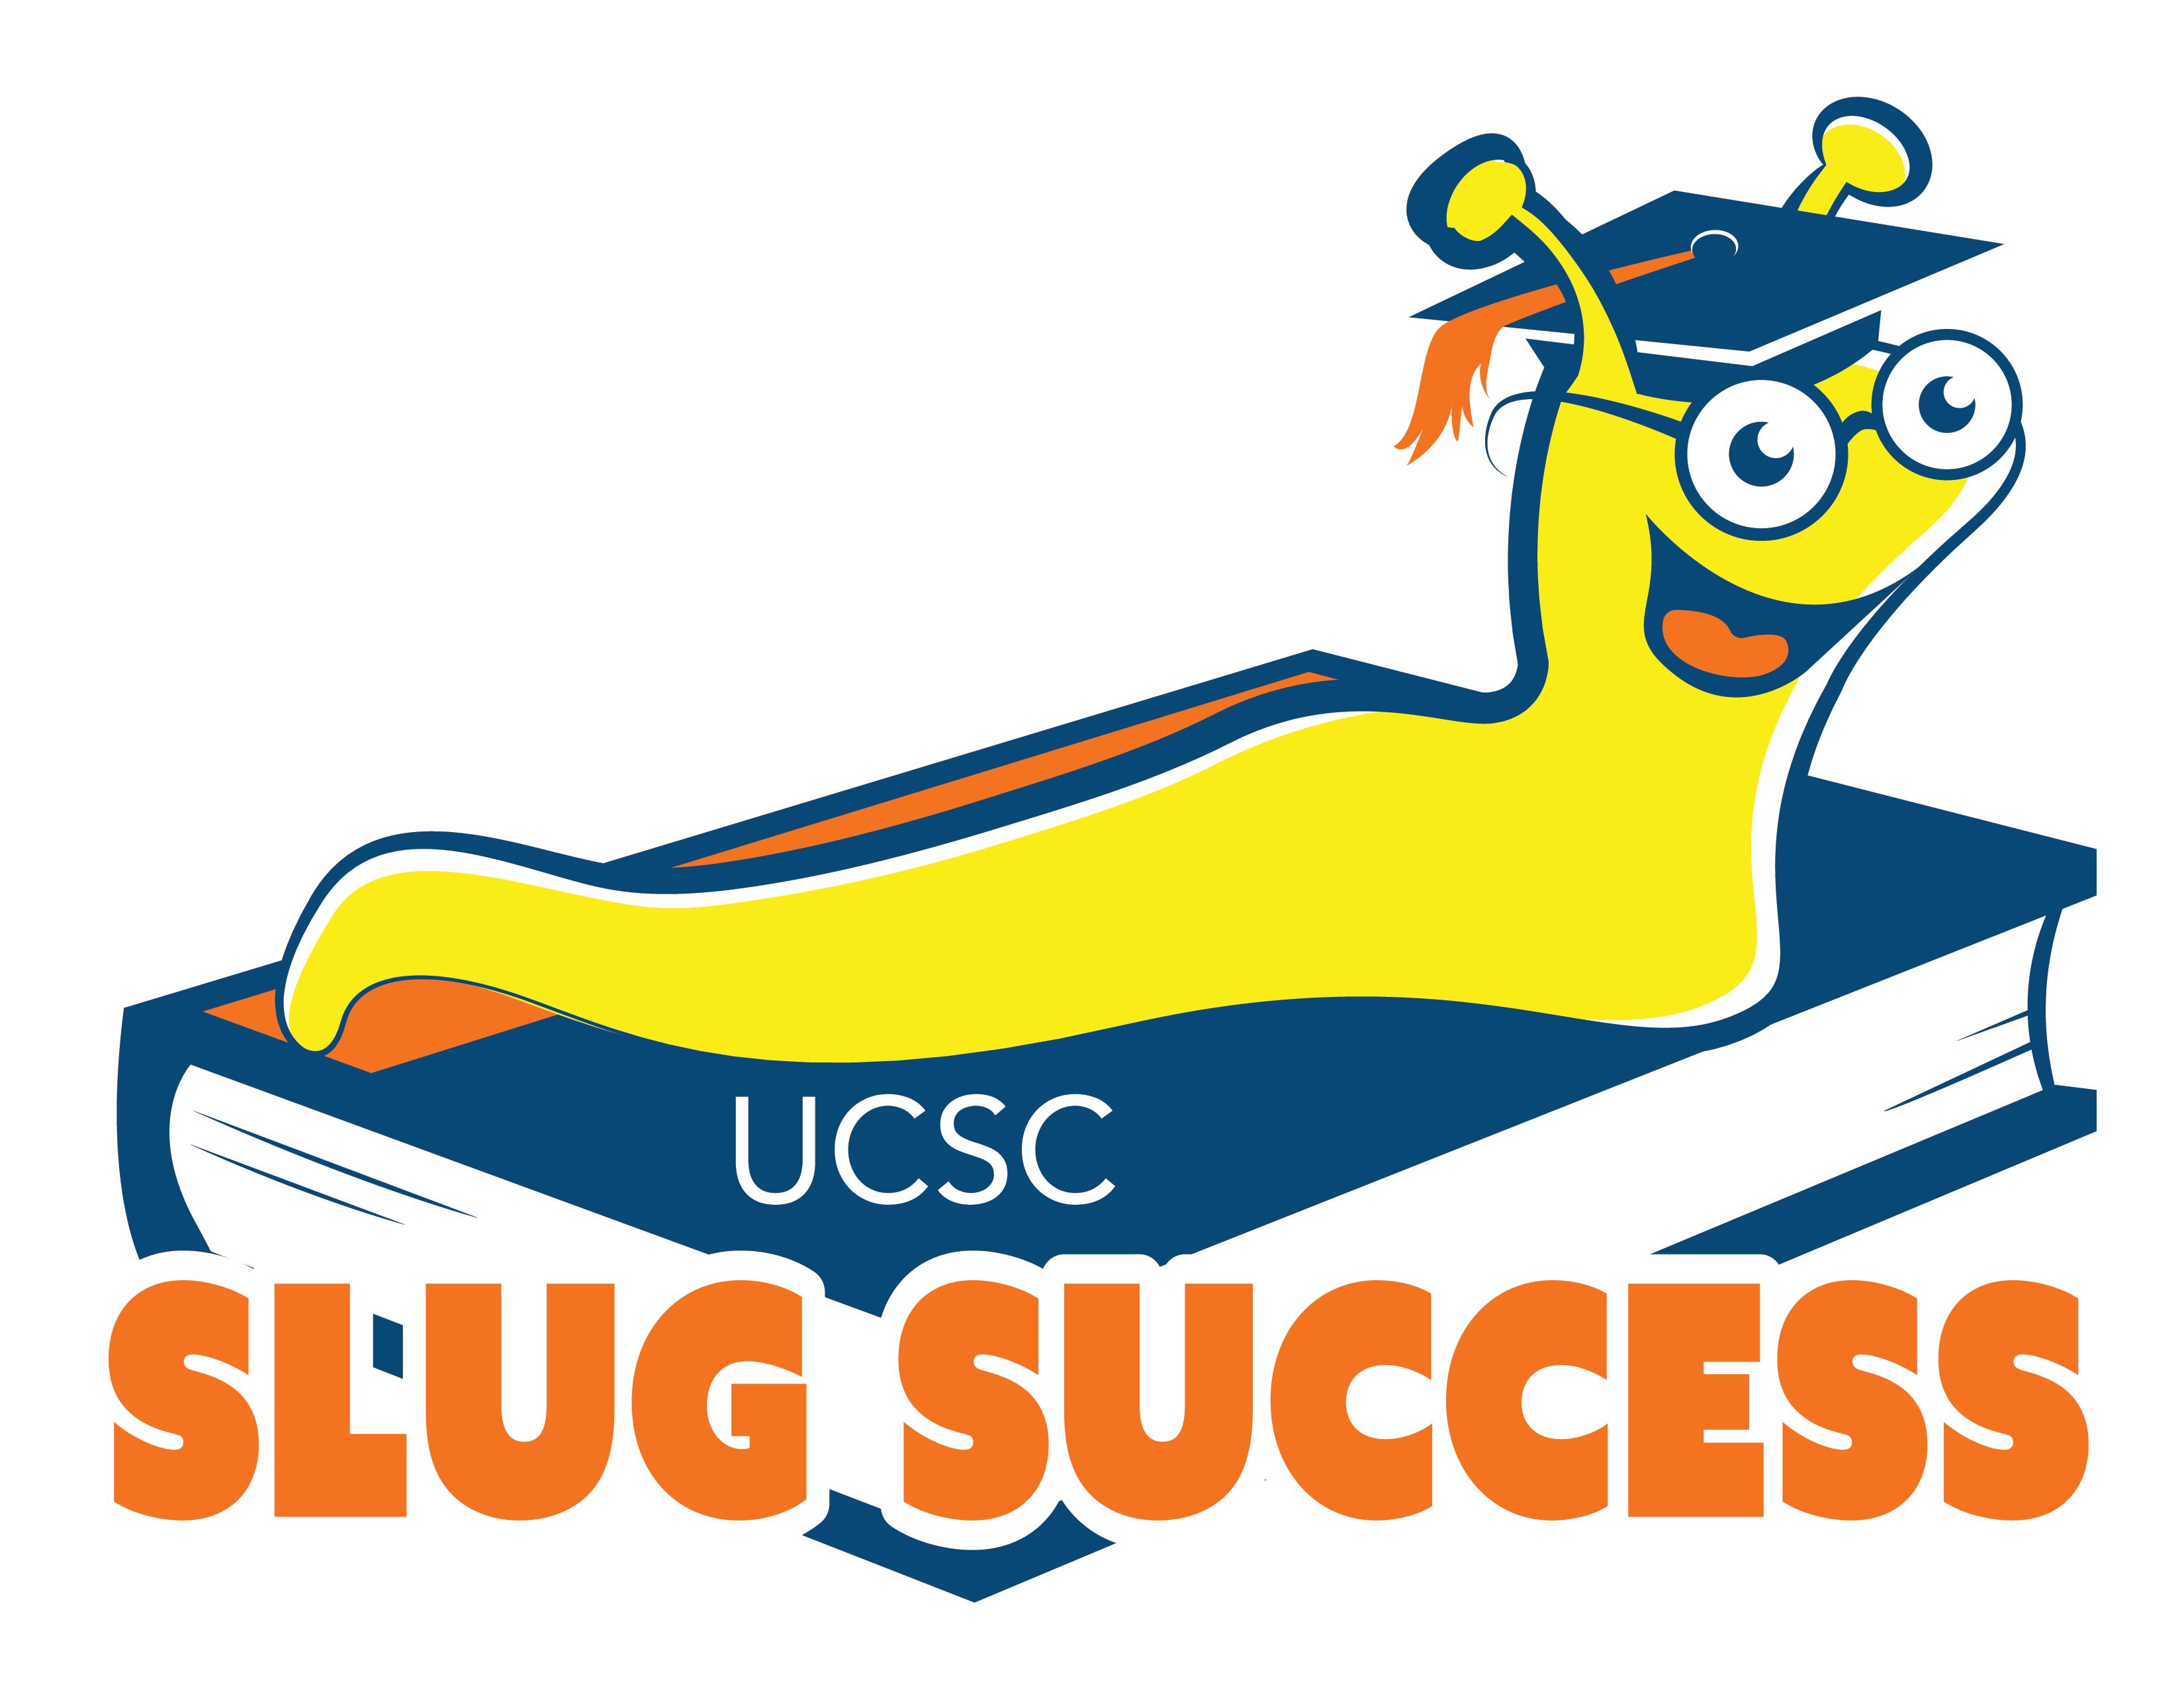 Psychology clipart academic advisor. Slug success ssc campus